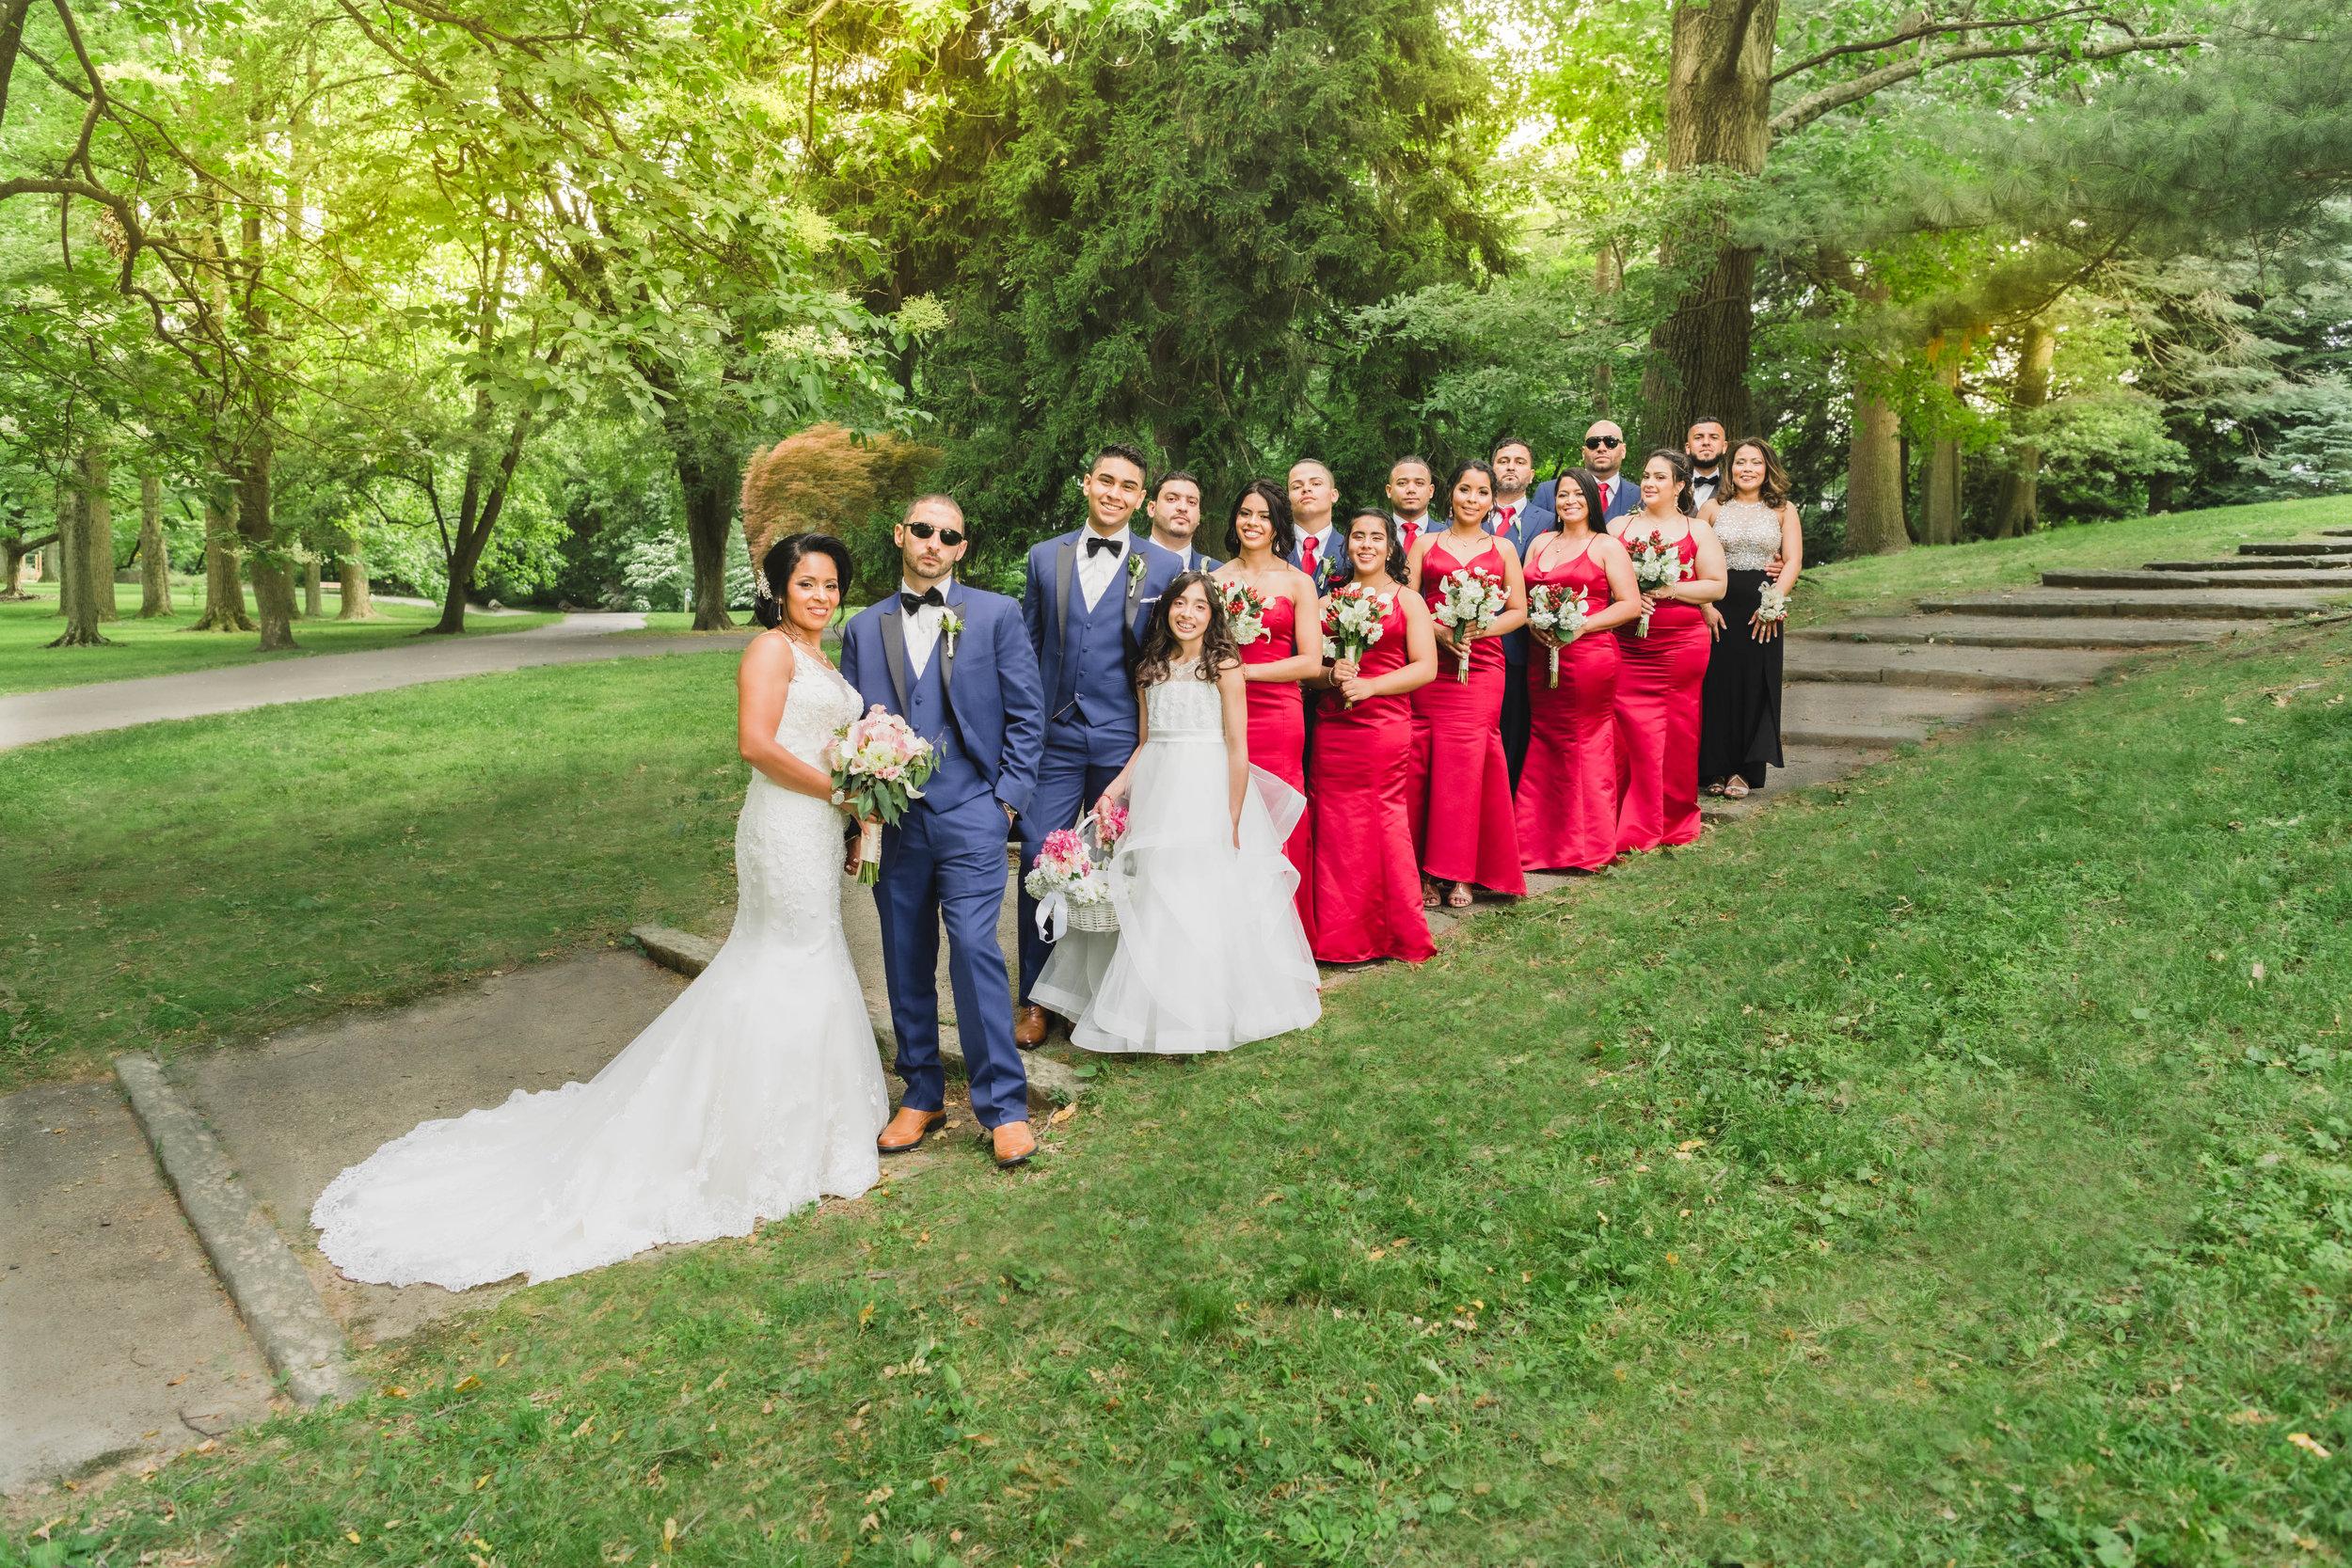 Botero-Wedding-06152019-00358-Edit.jpg